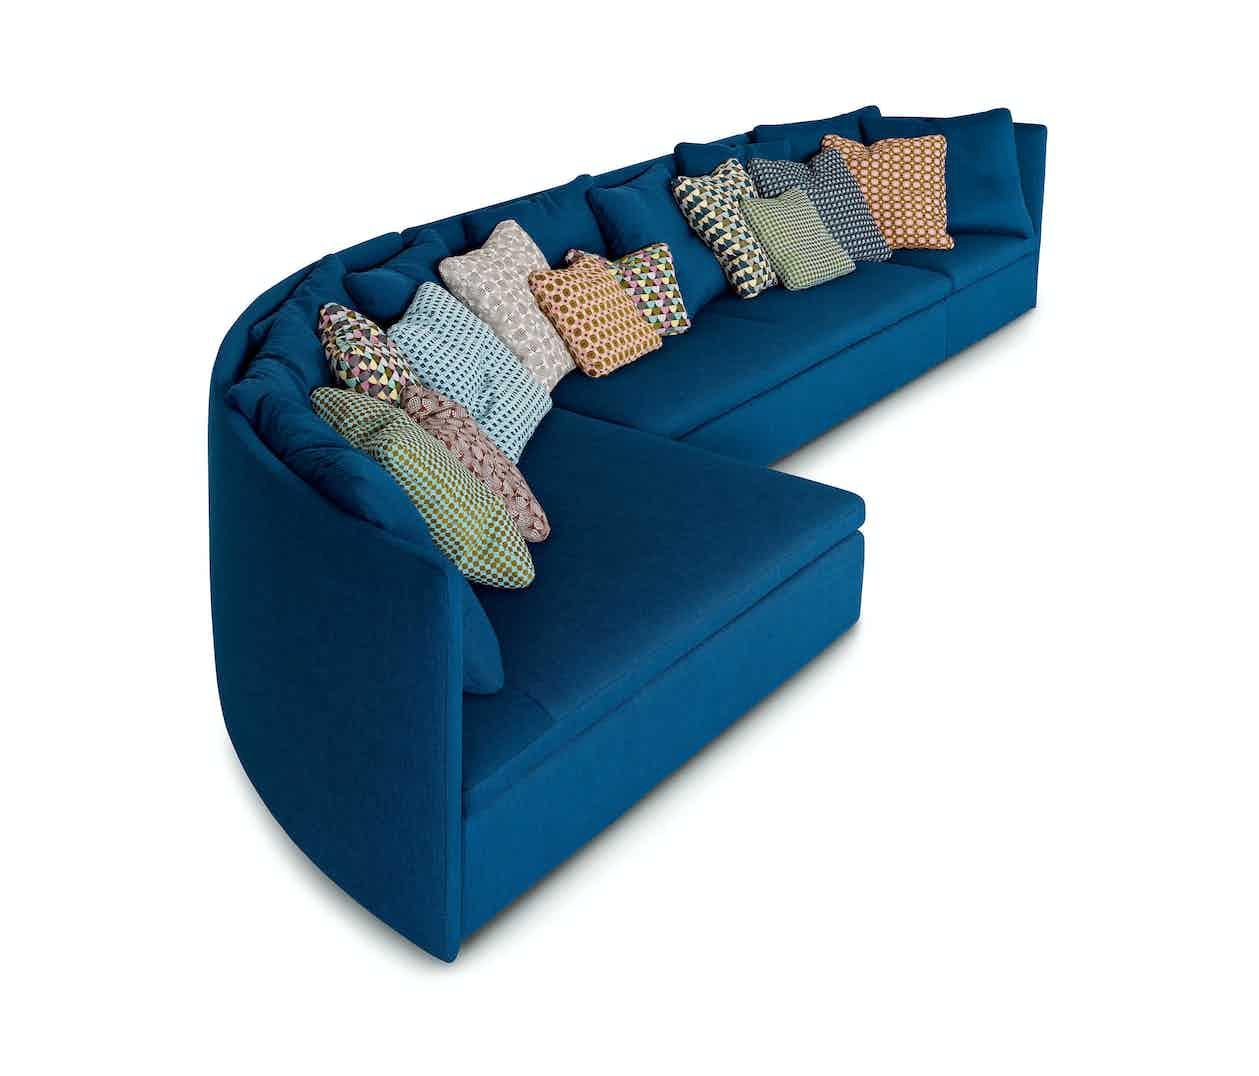 Arflex Blue Mangold Curved Sofa Side